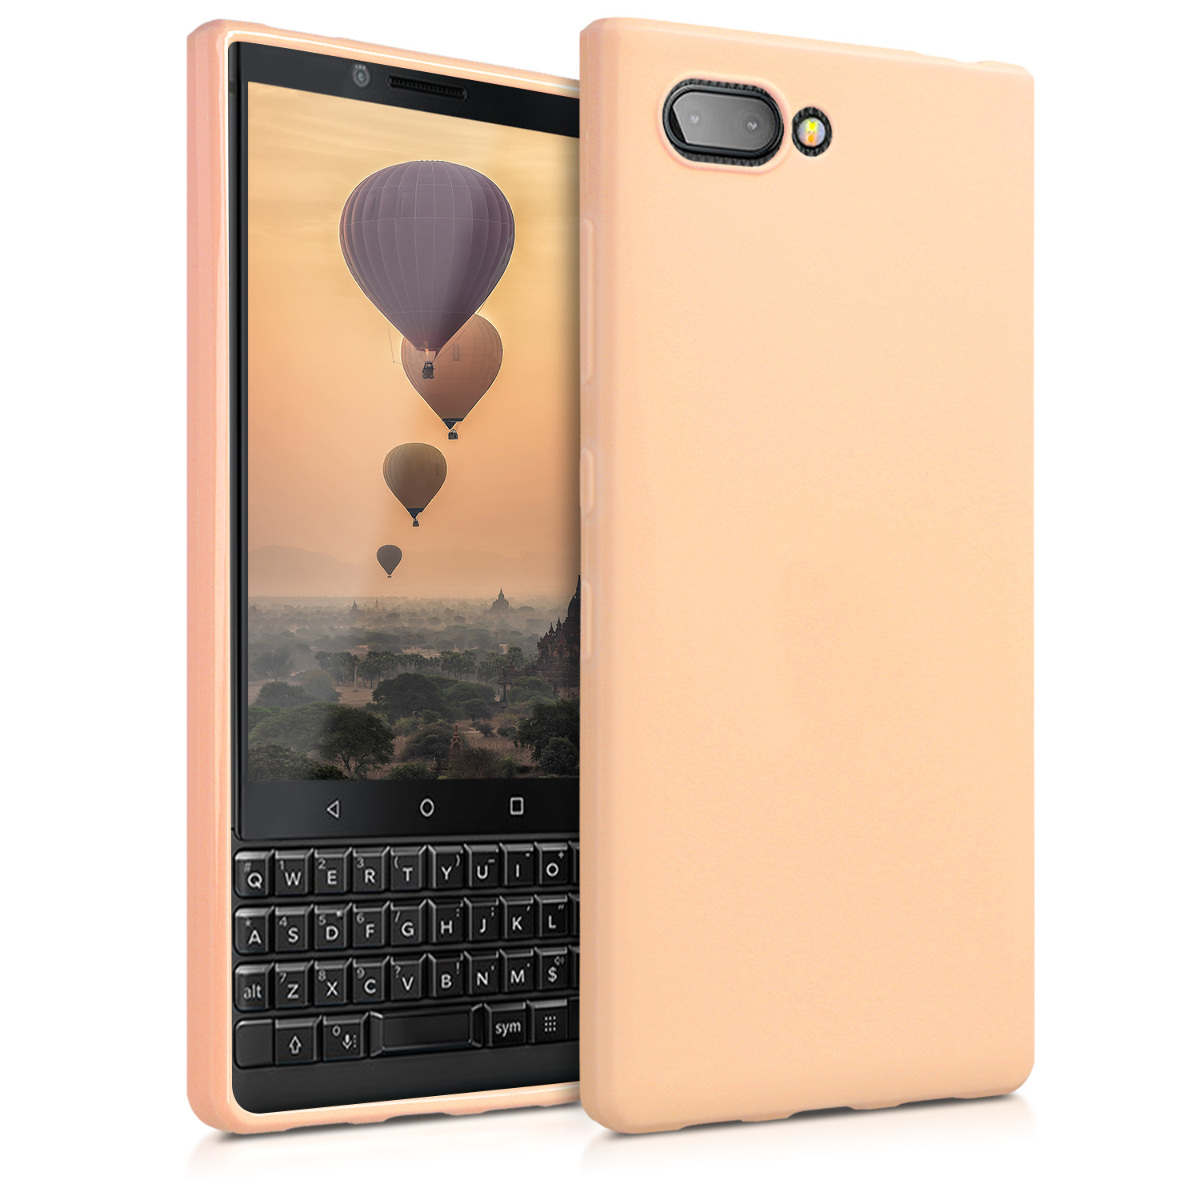 KW Θήκη Σιλικόνης Blackberry KEY2 - Peach (45435.138)